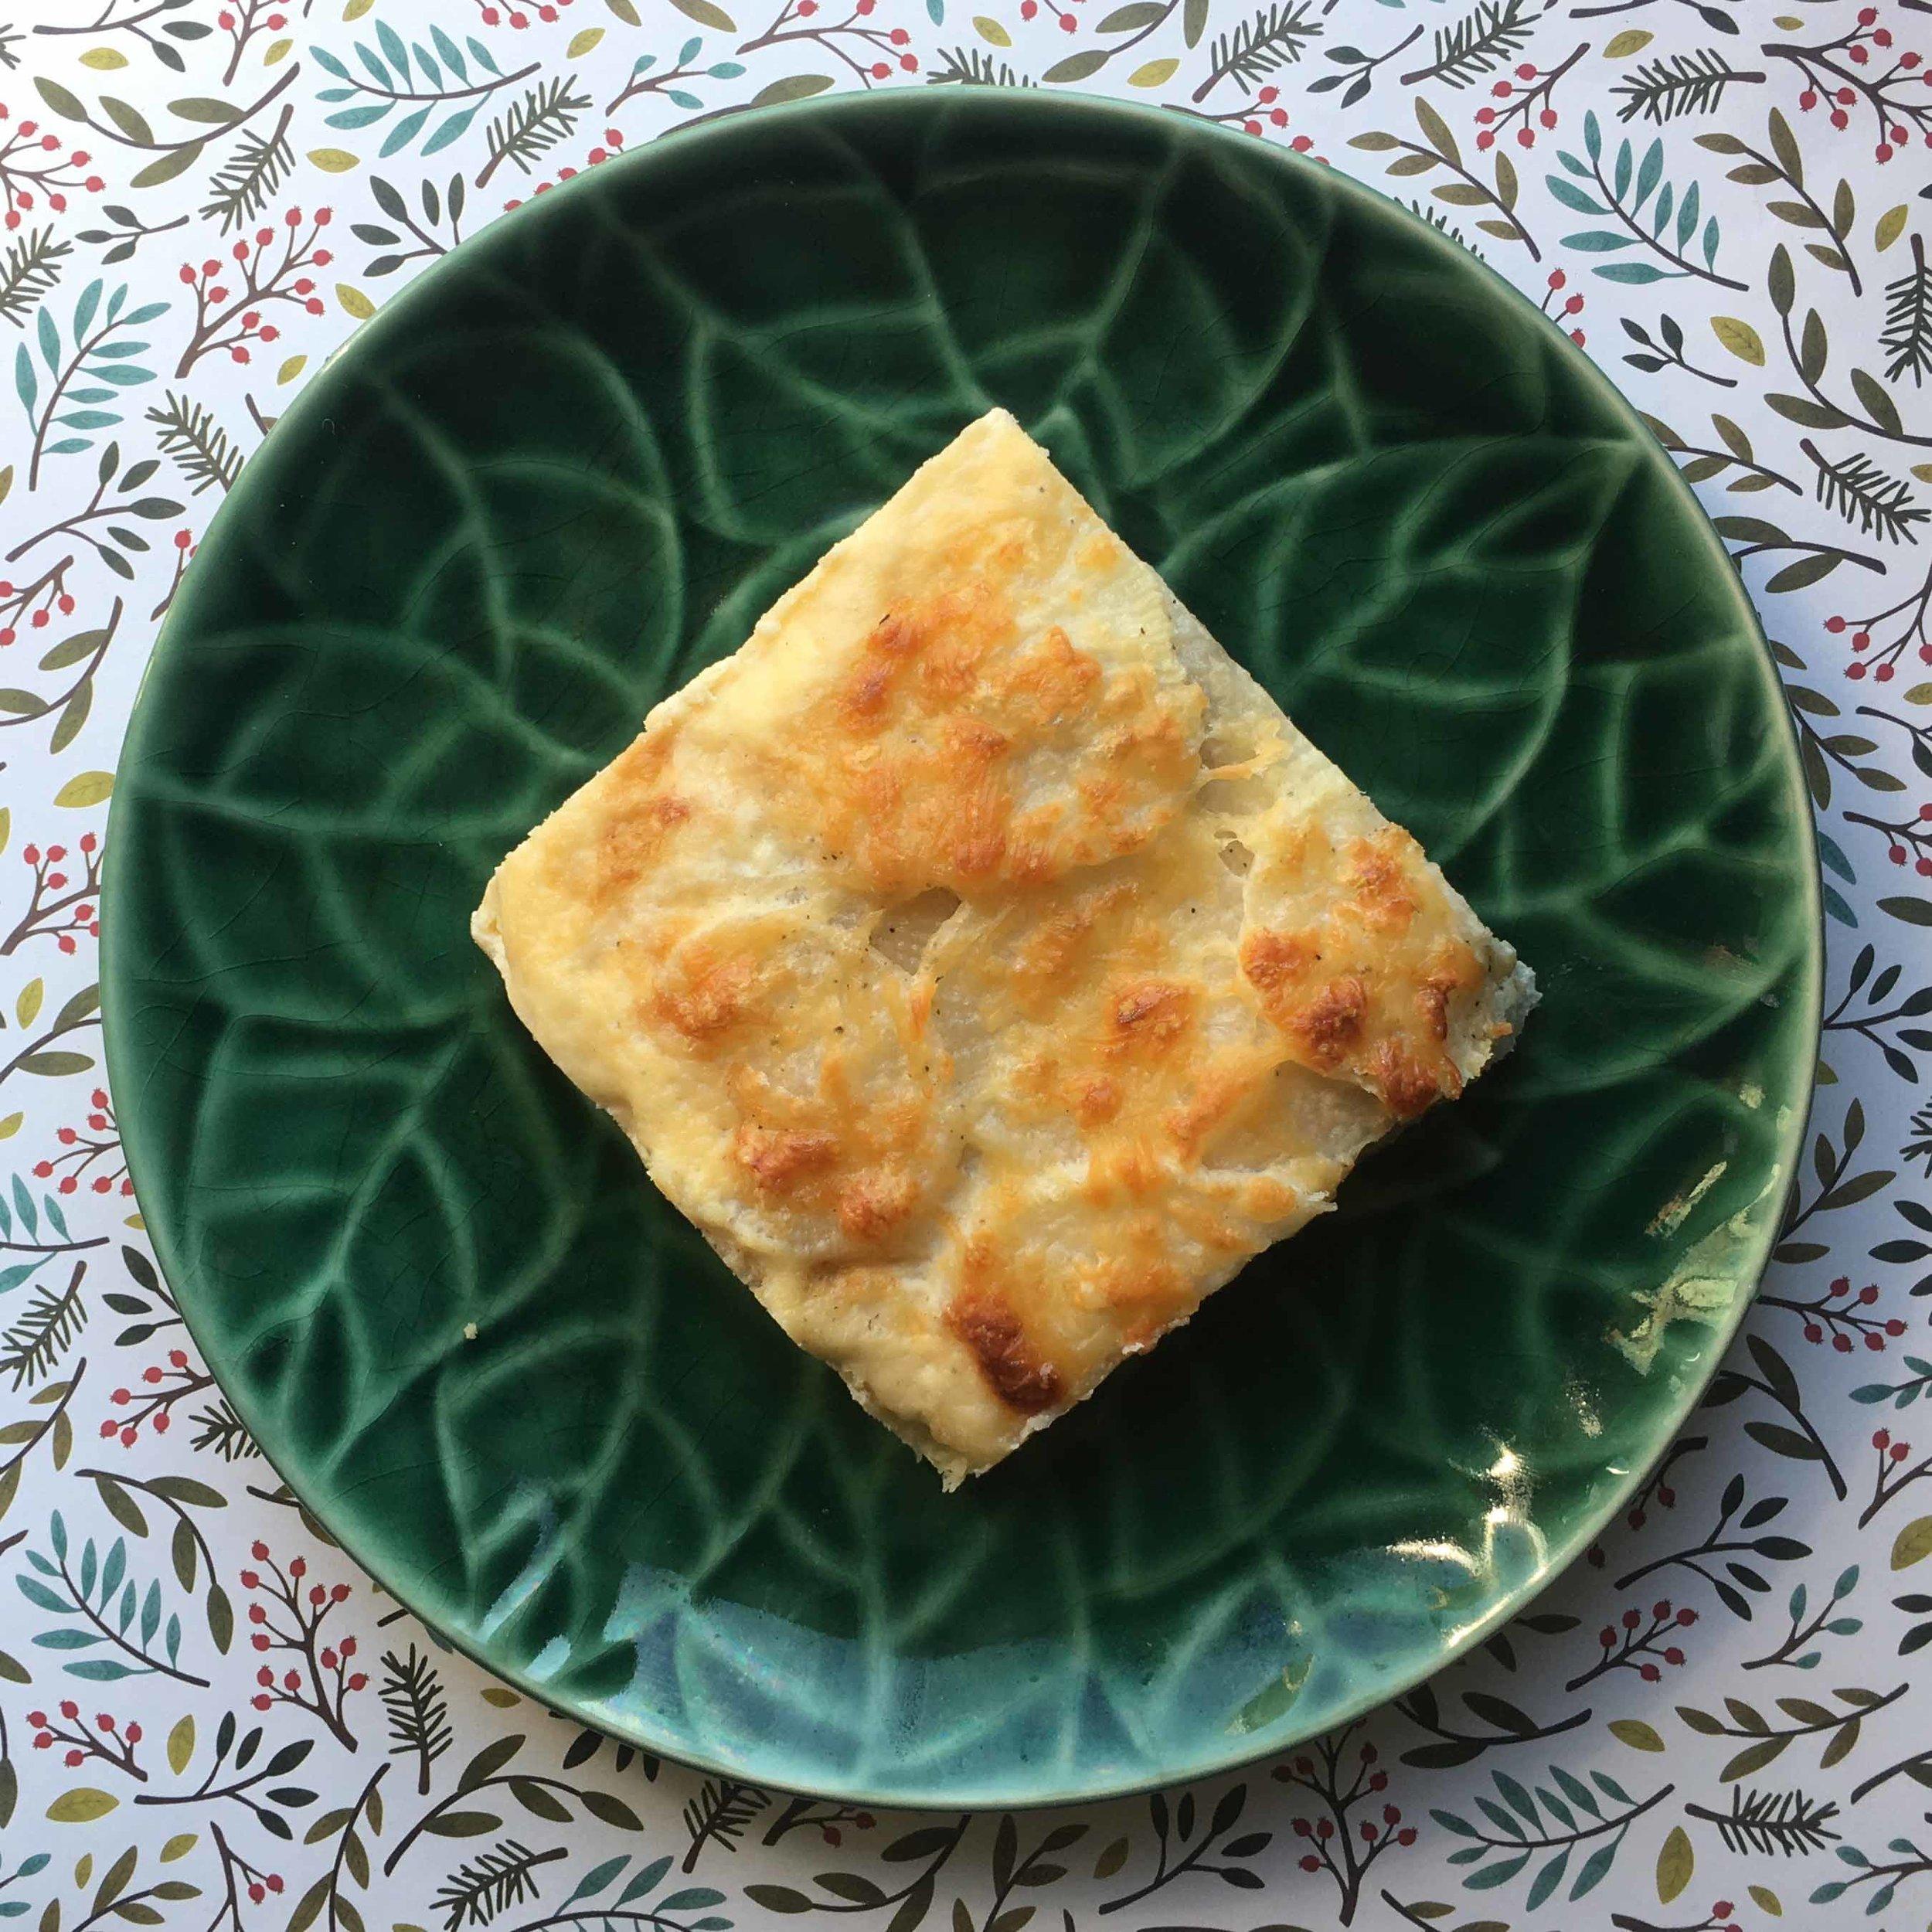 Low Carb Keto Scalloped Daikon Radishes Recipe